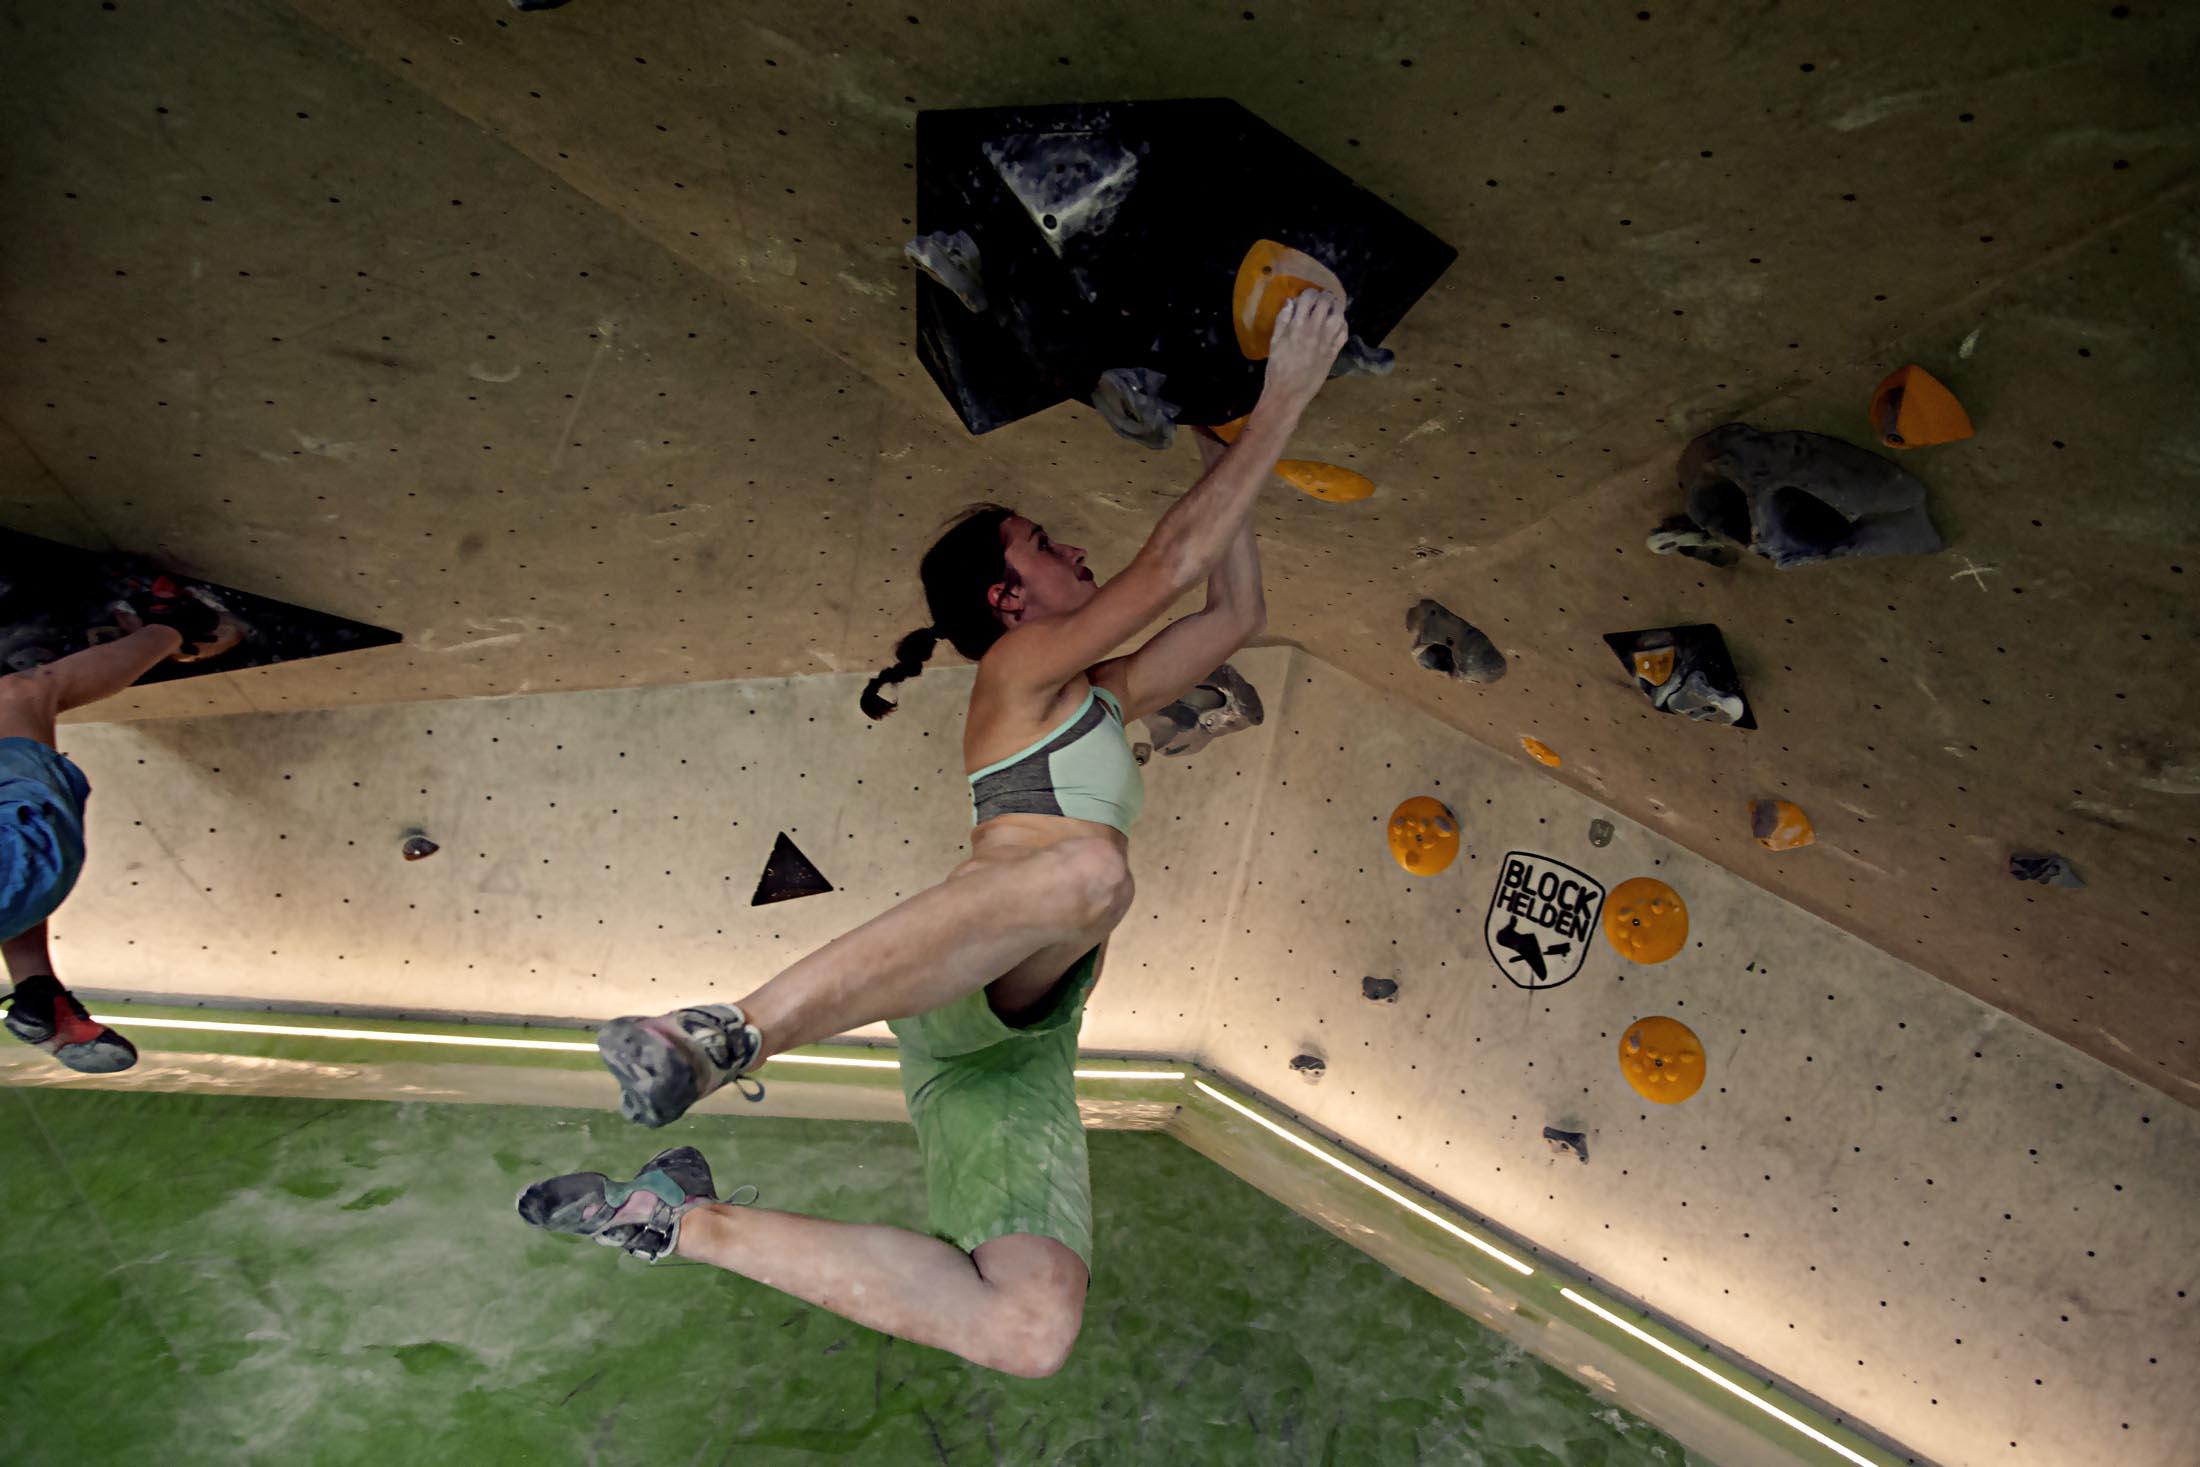 Quali, internationaler bouldercup Frankenjura 2016, BLOCKHELDEN Erlangen, Mammut, Bergfreunde.de, Boulderwettkampf07092016384